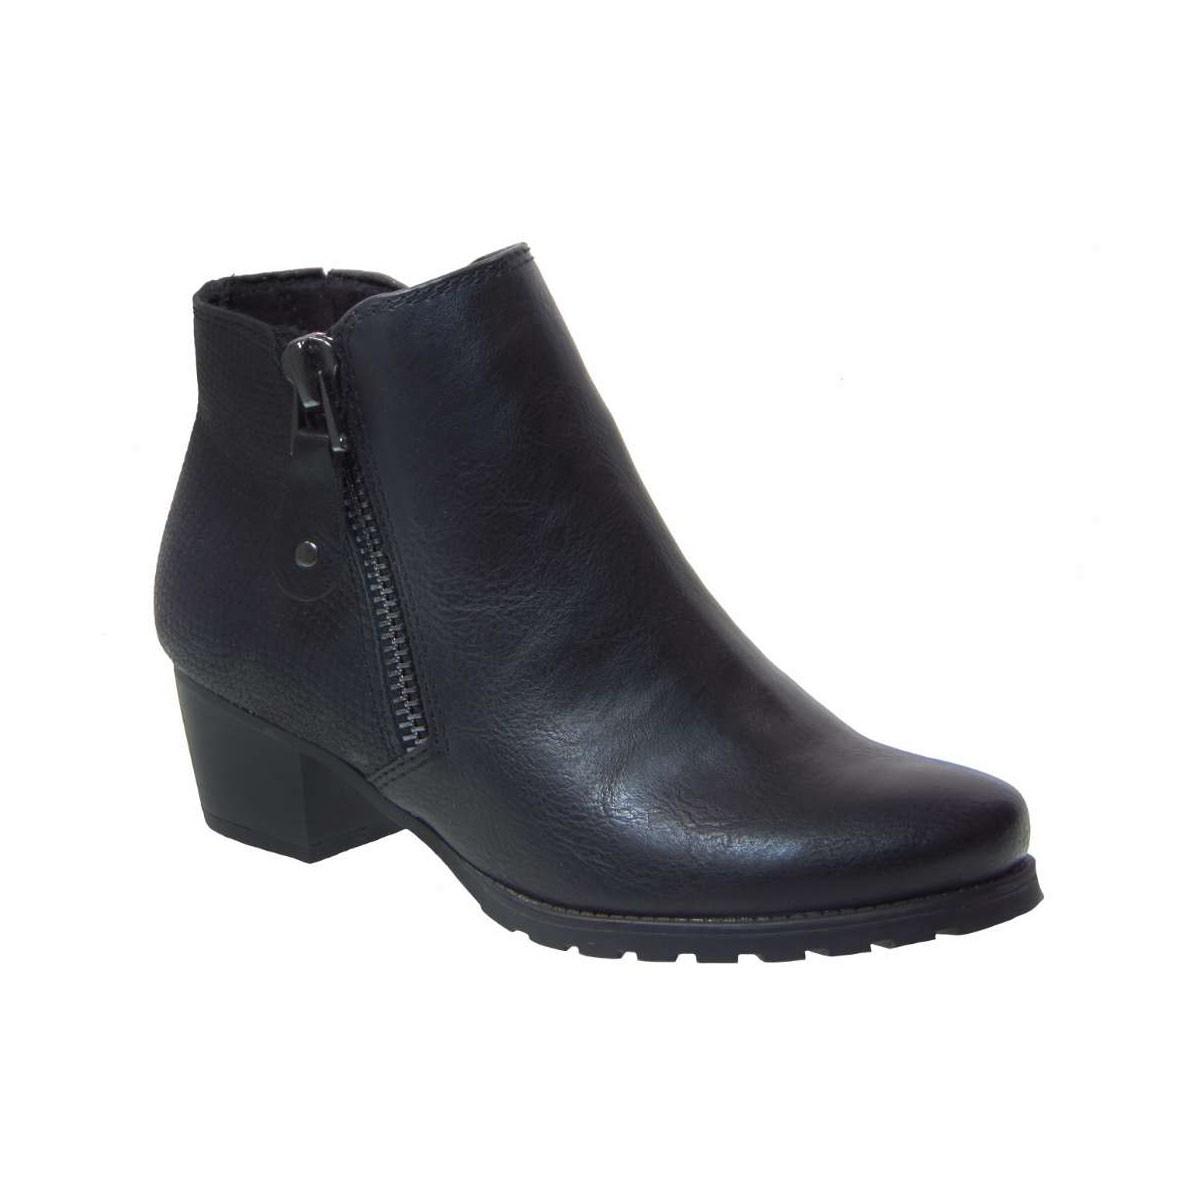 80c37ffa6c8 MARCO TOZZI - Γυναικείες Μπότες-Μποτάκια | Outfit.gr